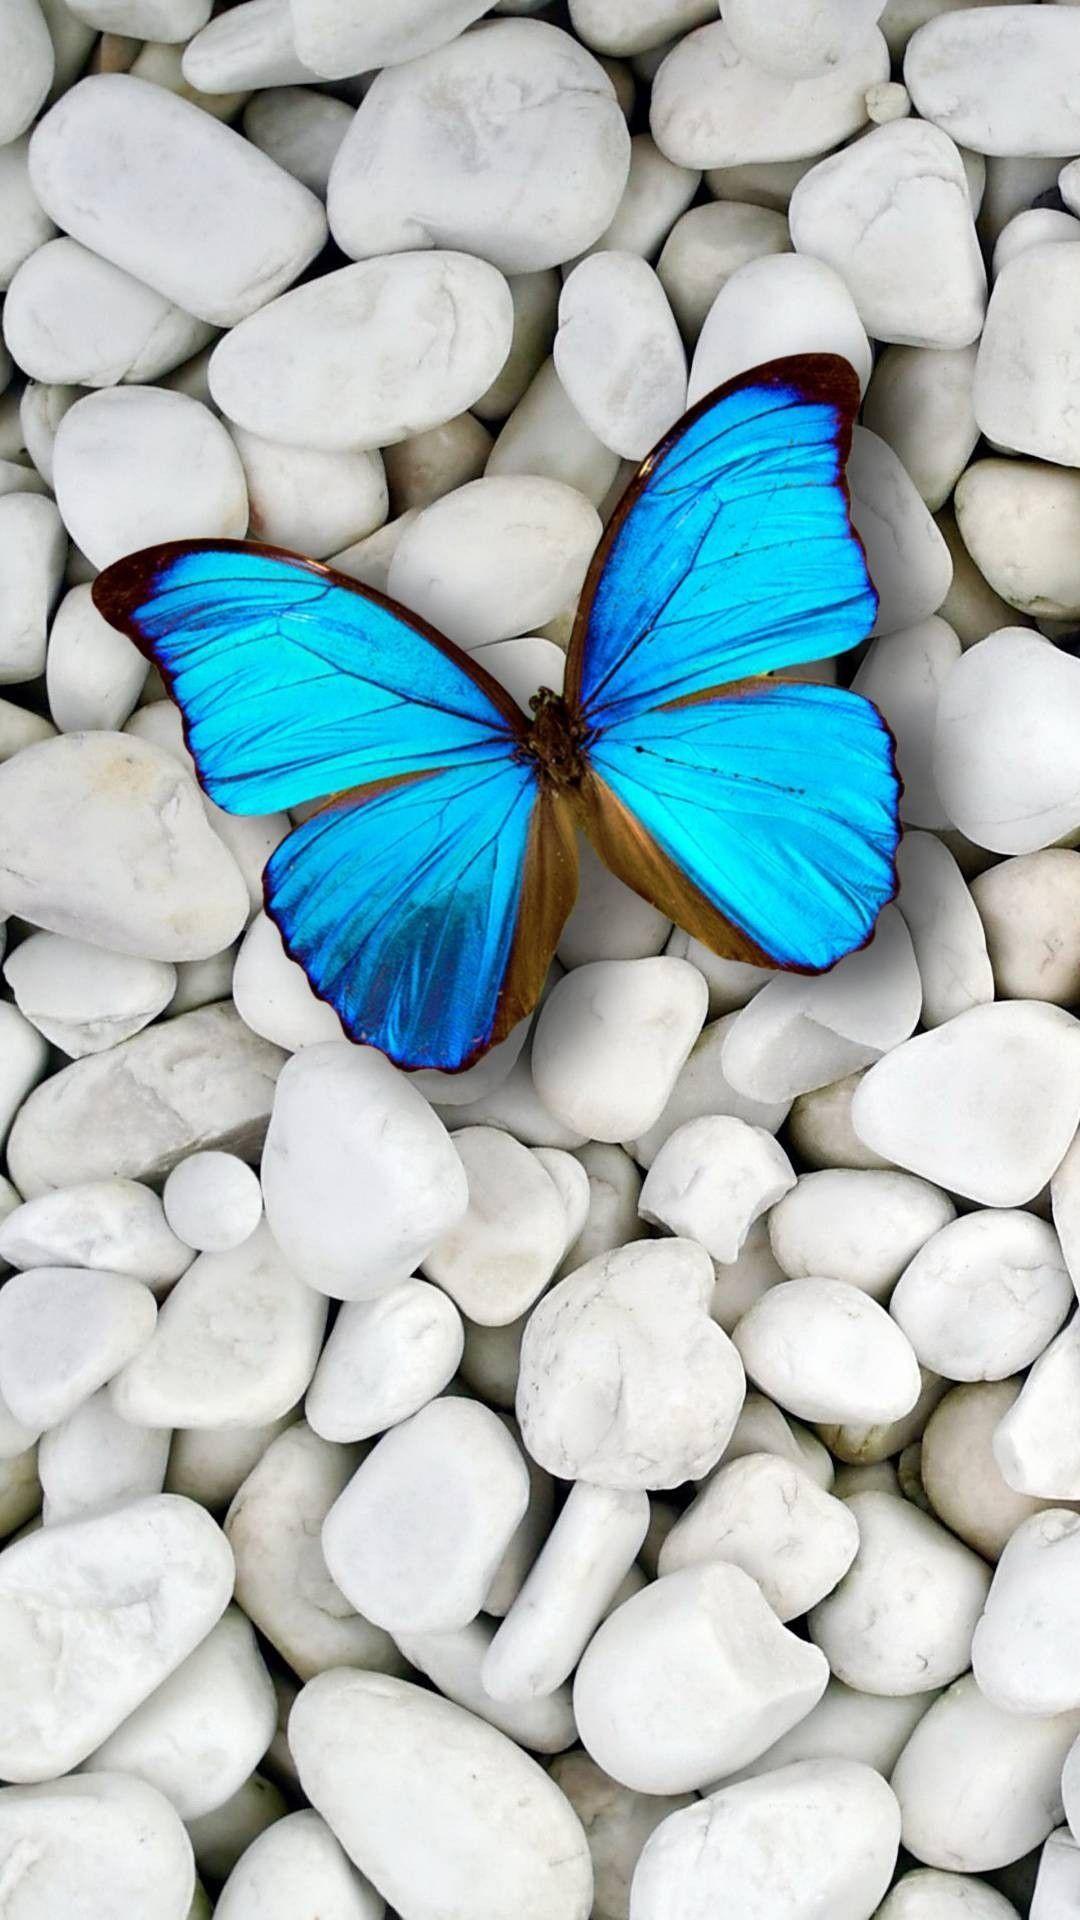 Butterfly Samsung Galaxy s7 wallpaper